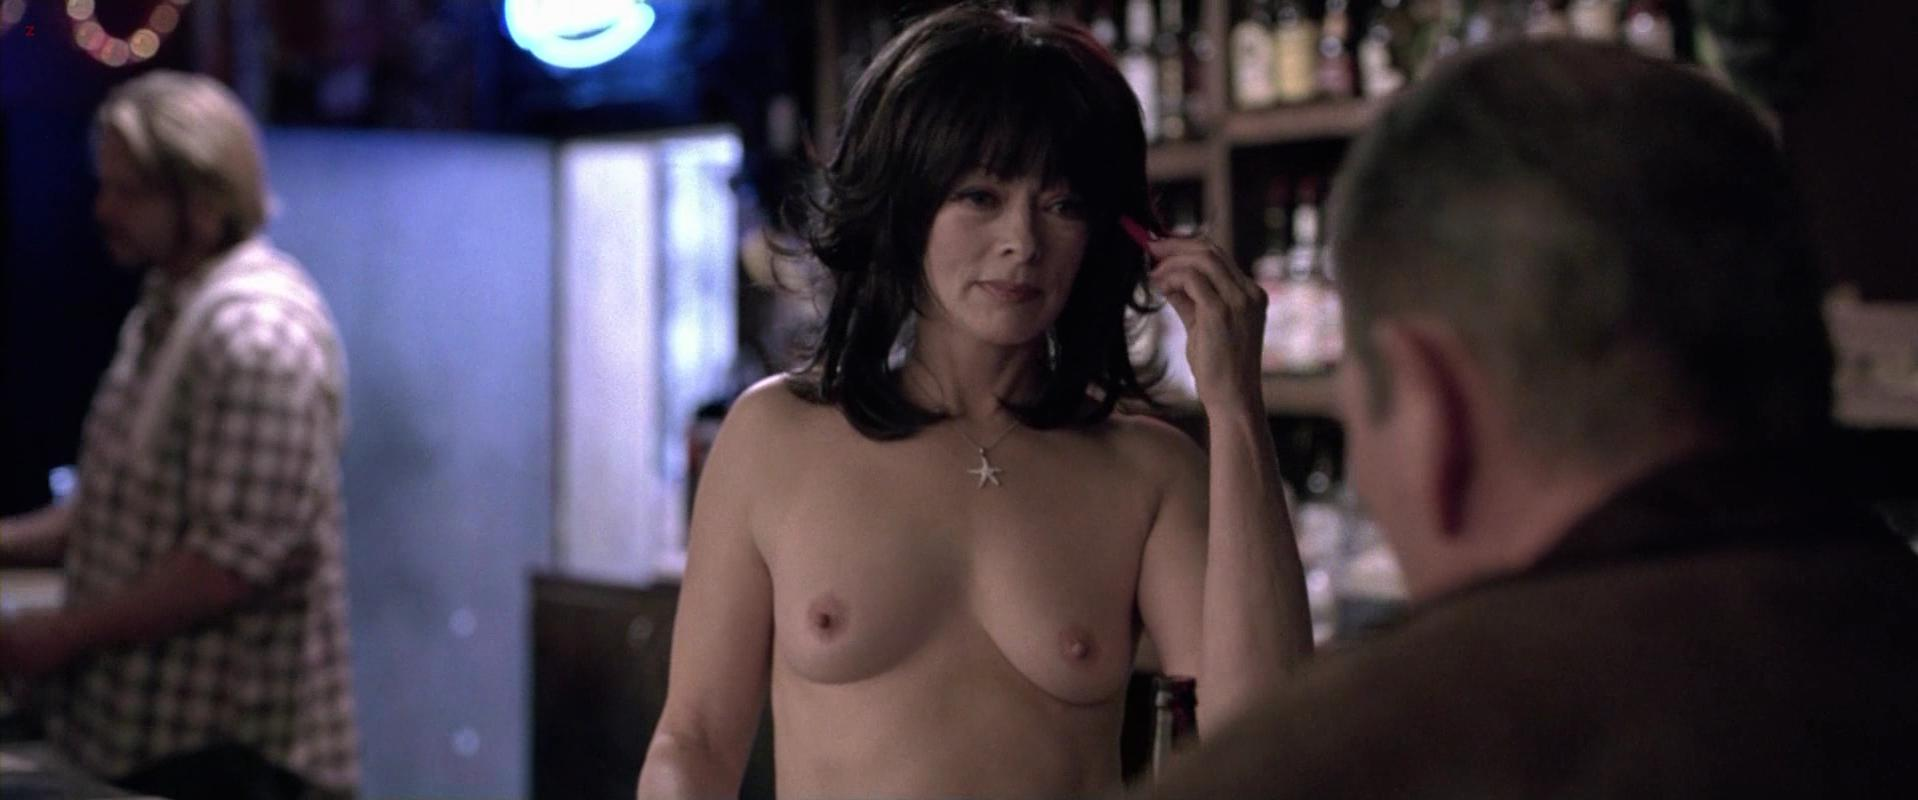 stocking hairy mature porno